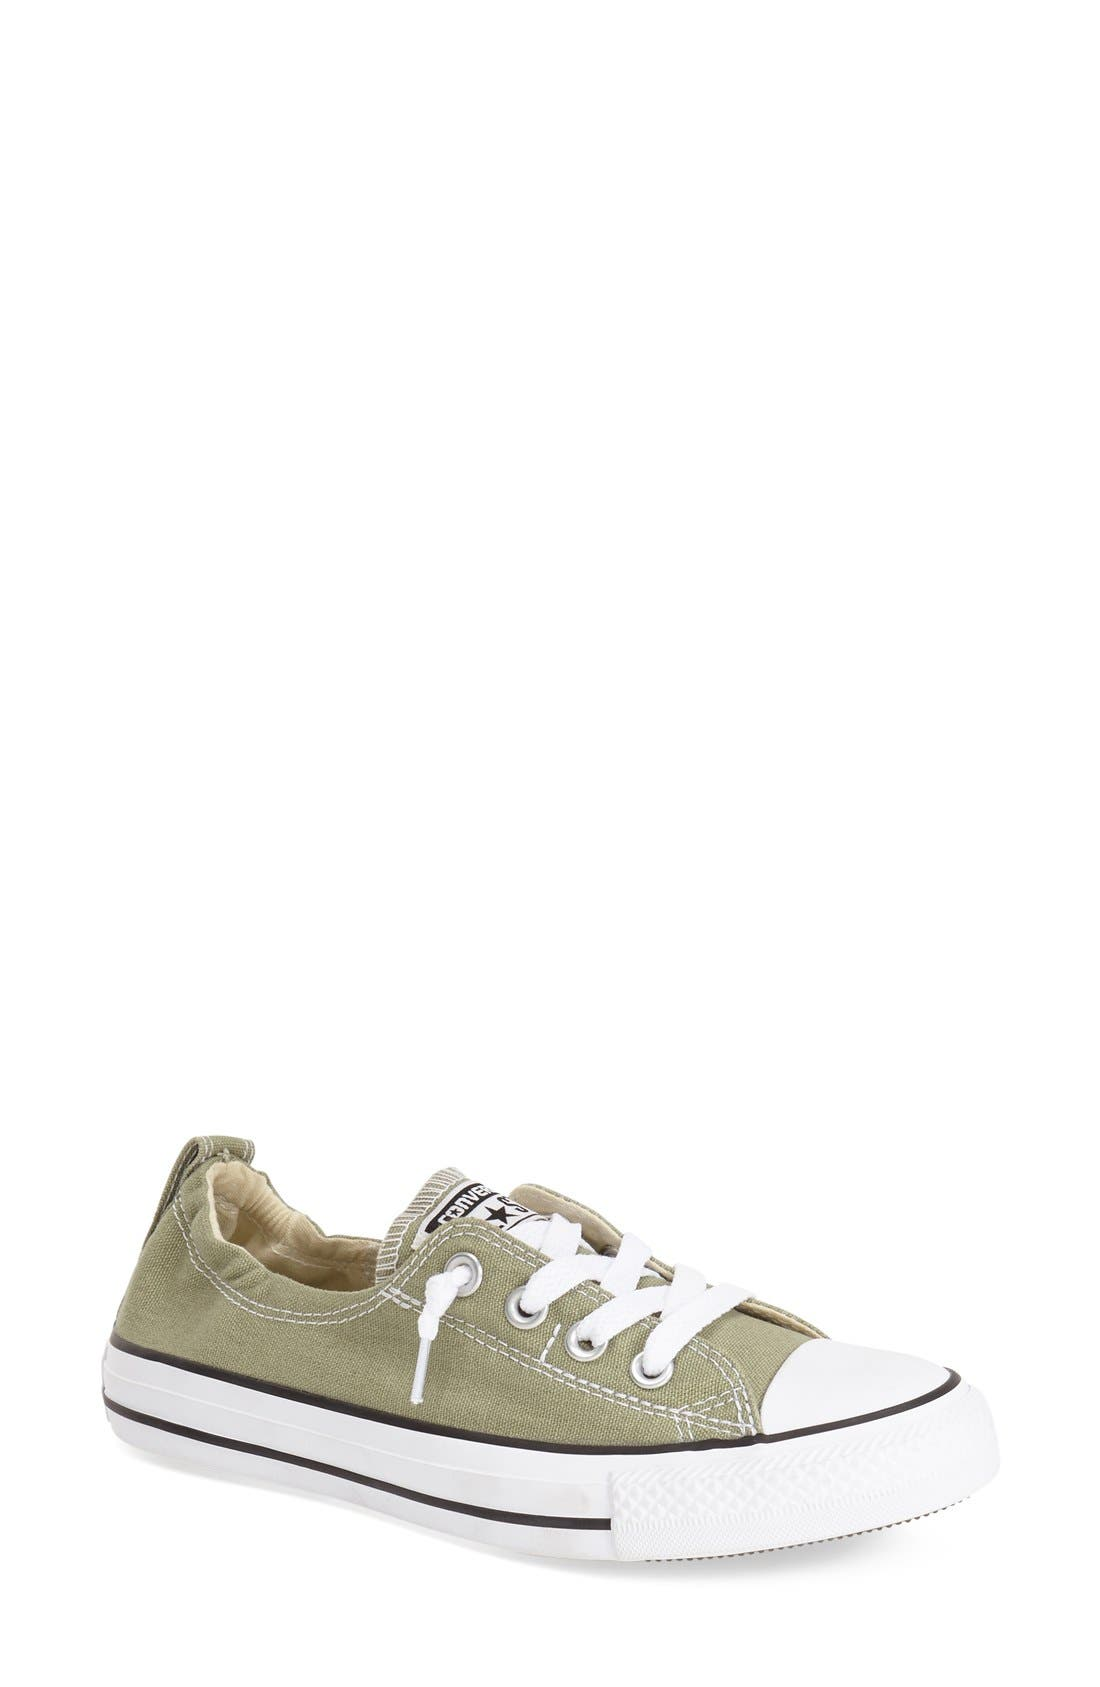 Alternate Image 1 Selected - Converse Chuck Taylor® All Star® 'Shoreline' Sneaker (Women)